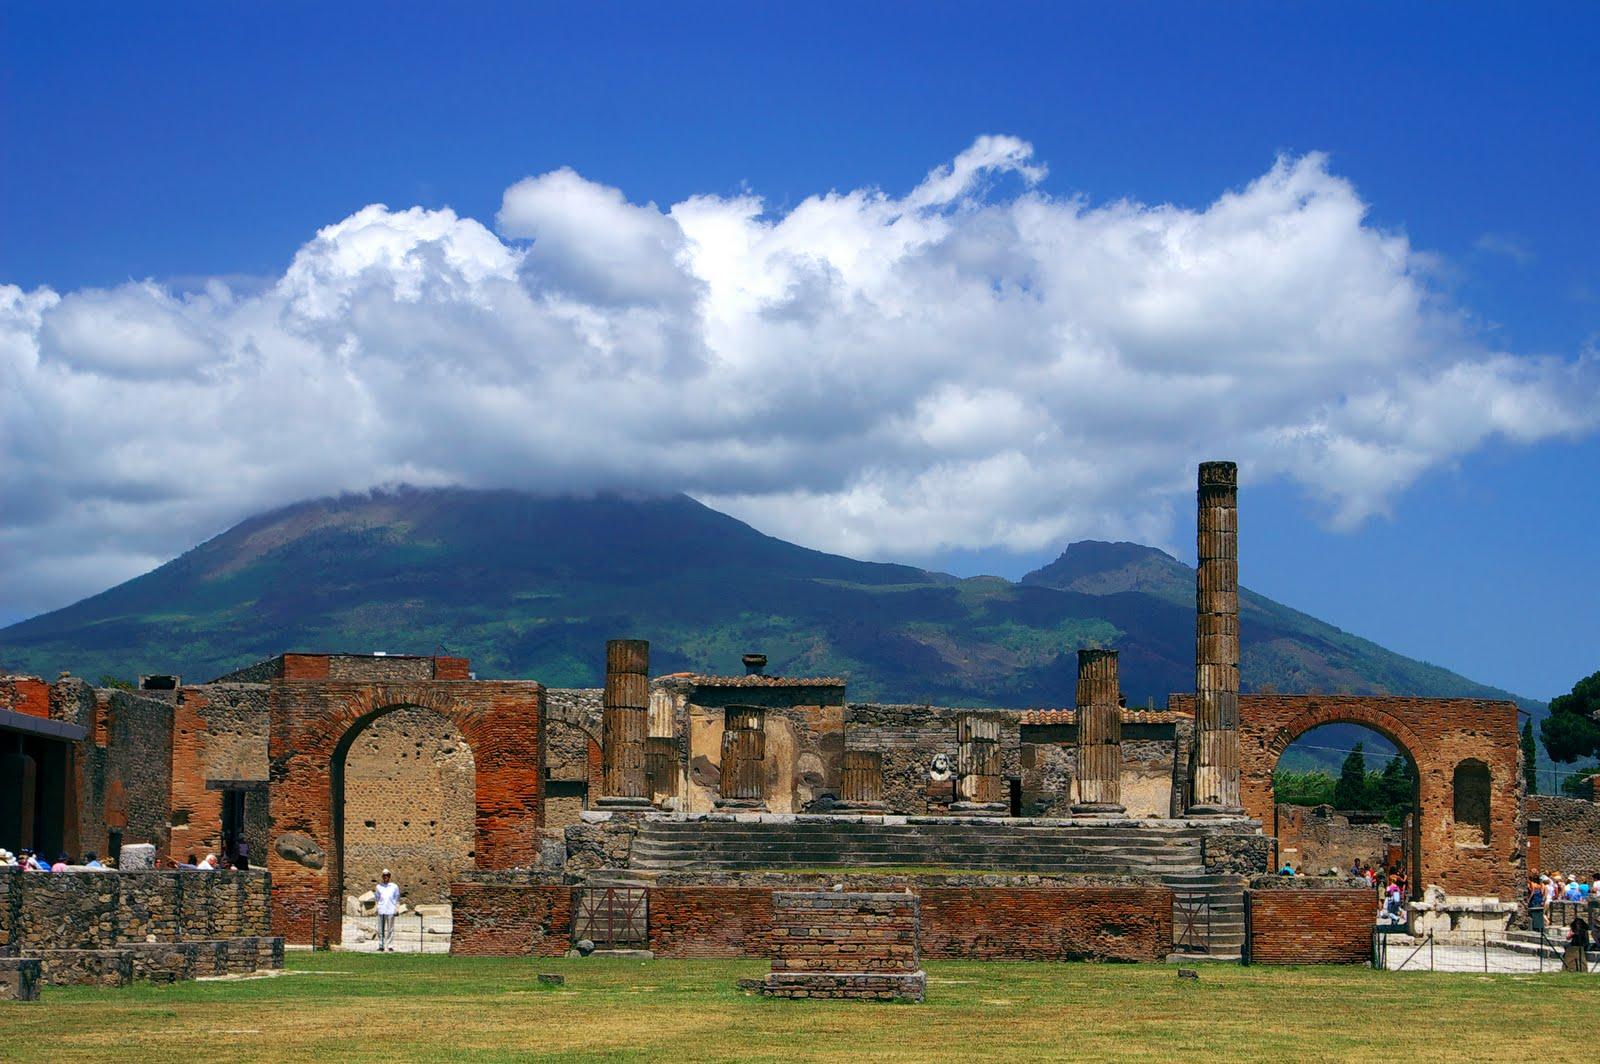 pompeii - photo #31